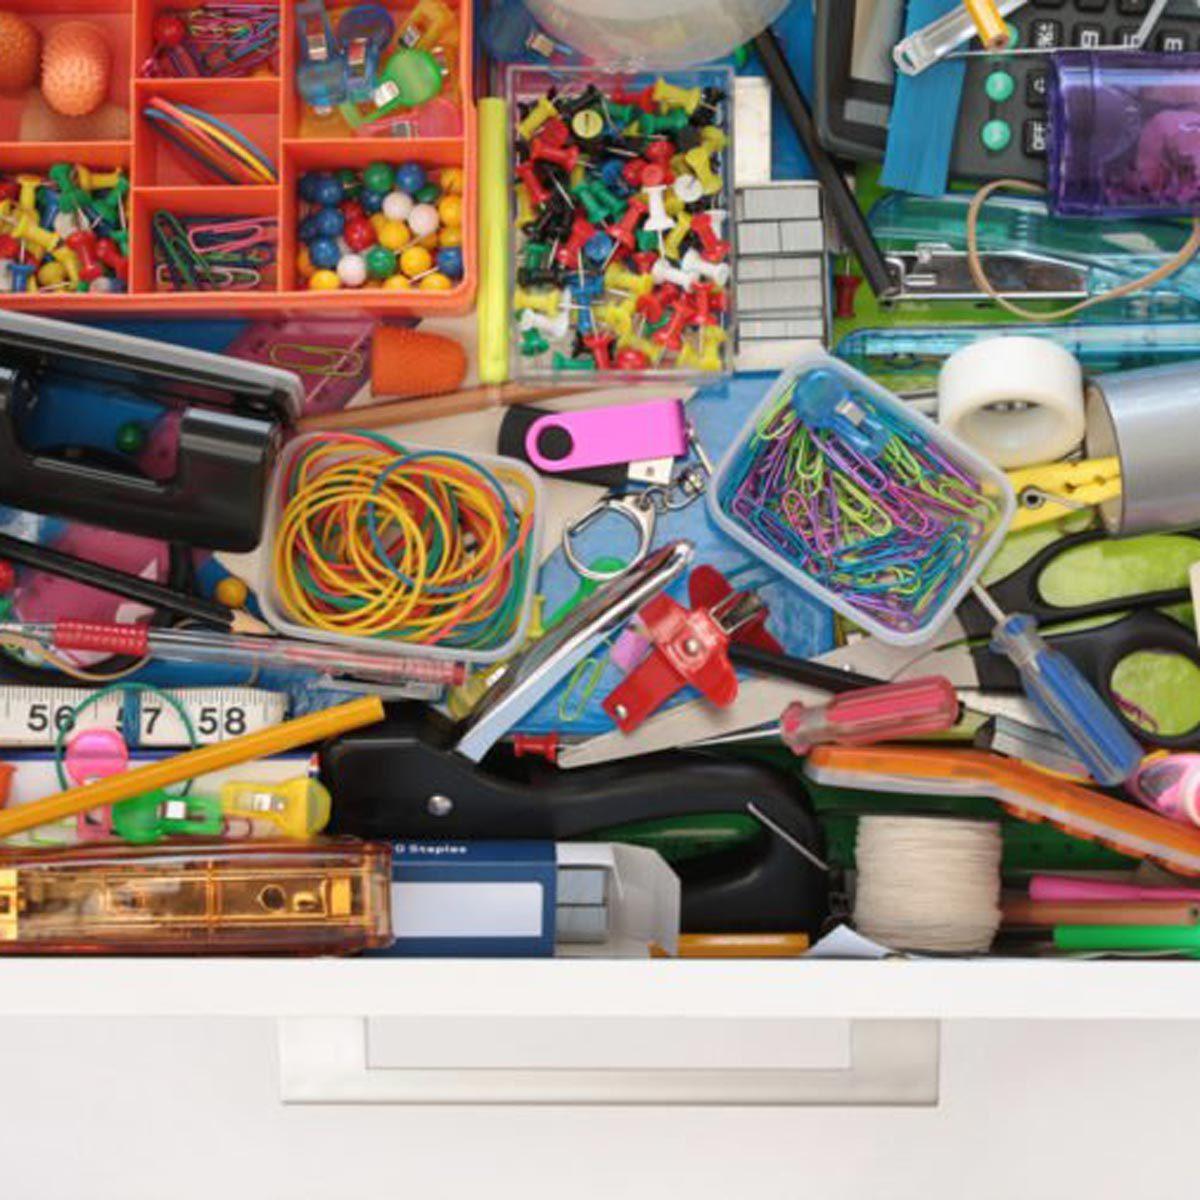 Junk drawer